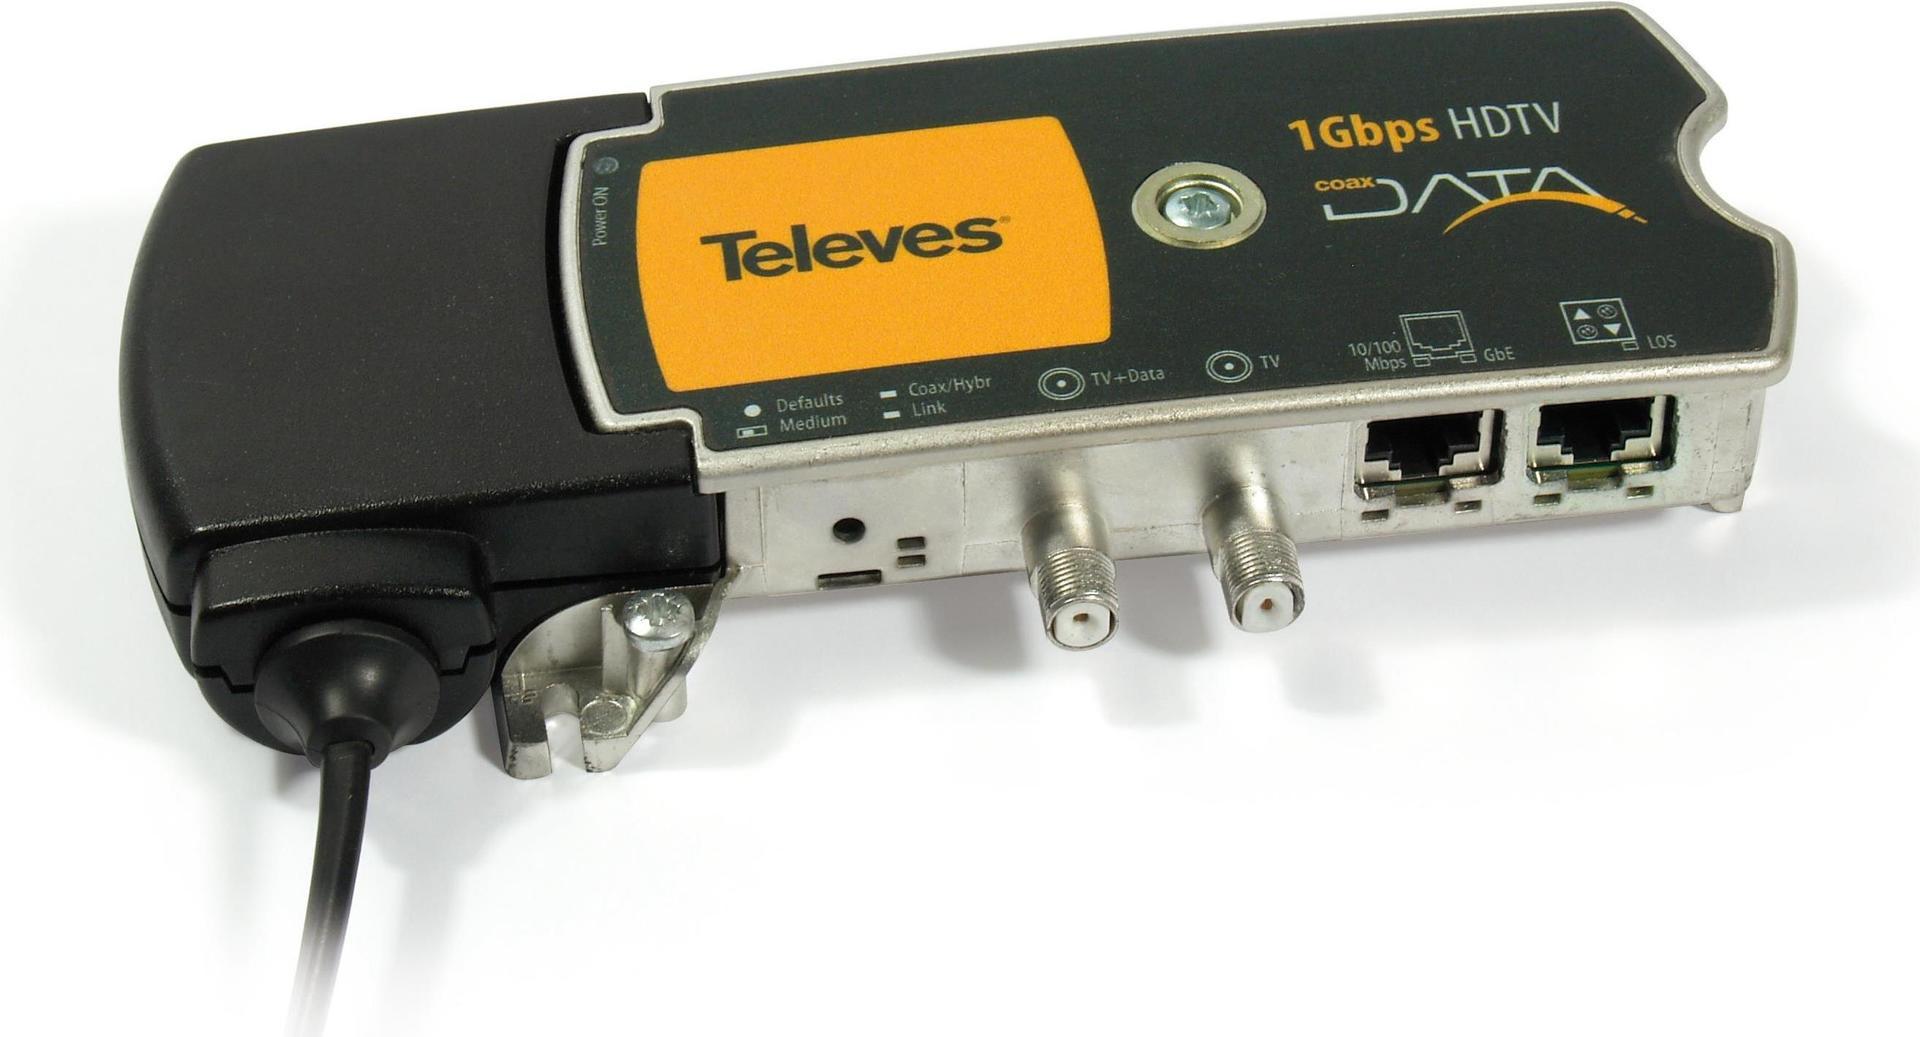 Preisner EKA1000 1000Mbit/s Schwarz - Gelb Netz...